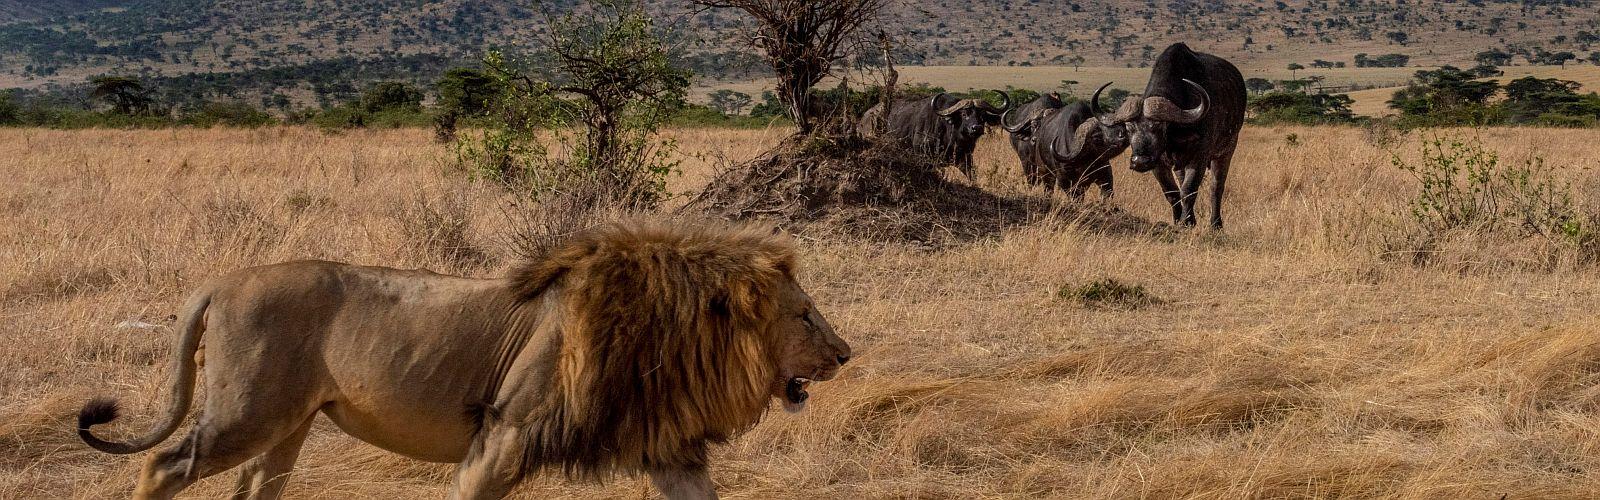 Avontuurlijke safari